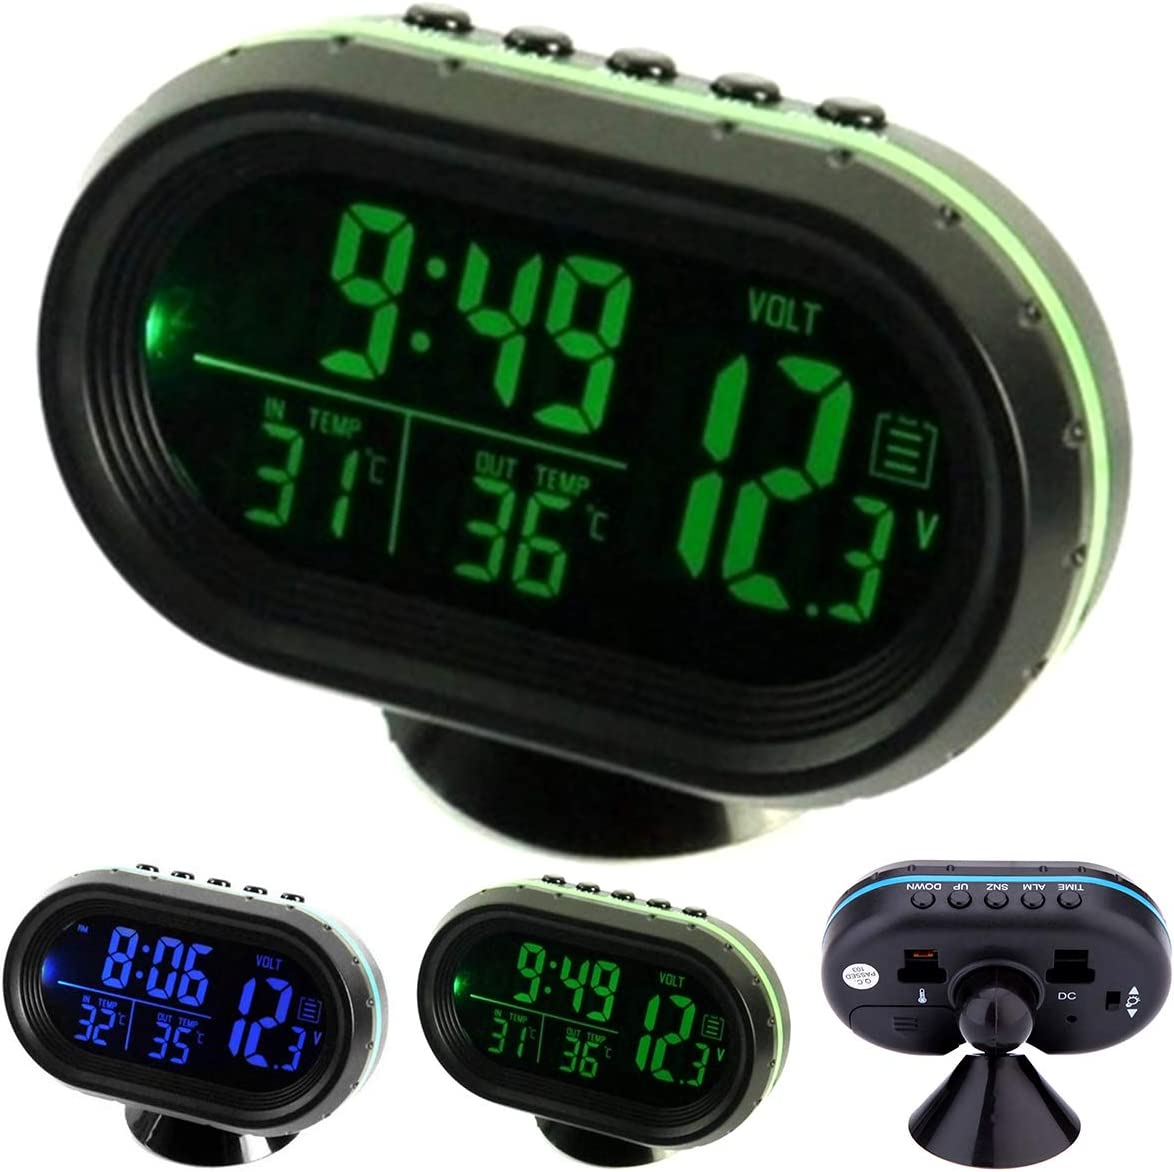 Blue//Greed Dibiao Auto Vehicles Dual Temperature Gauge Voltmeter Clock,Car Thermometer Digital Clock